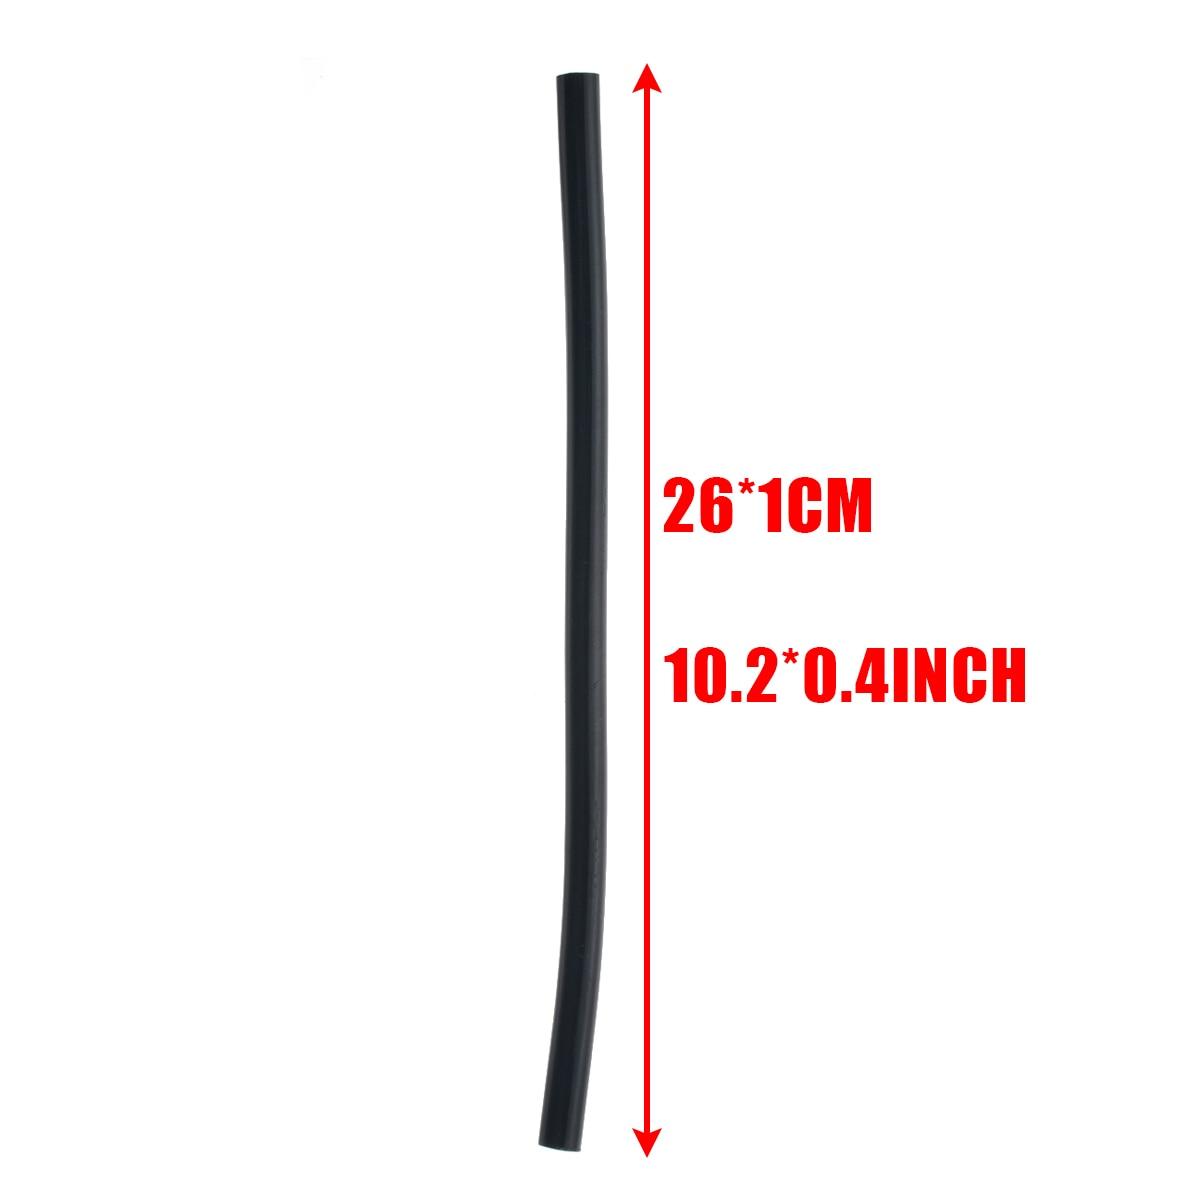 5 stks/set Hot Melt Lijm Stok Zwart Hoge Zelfklevende Melt Lijm Sticks Auto Body Verveloos Dent 11mm Voor DIY ambachtelijke Speelgoed Reparatie Tool